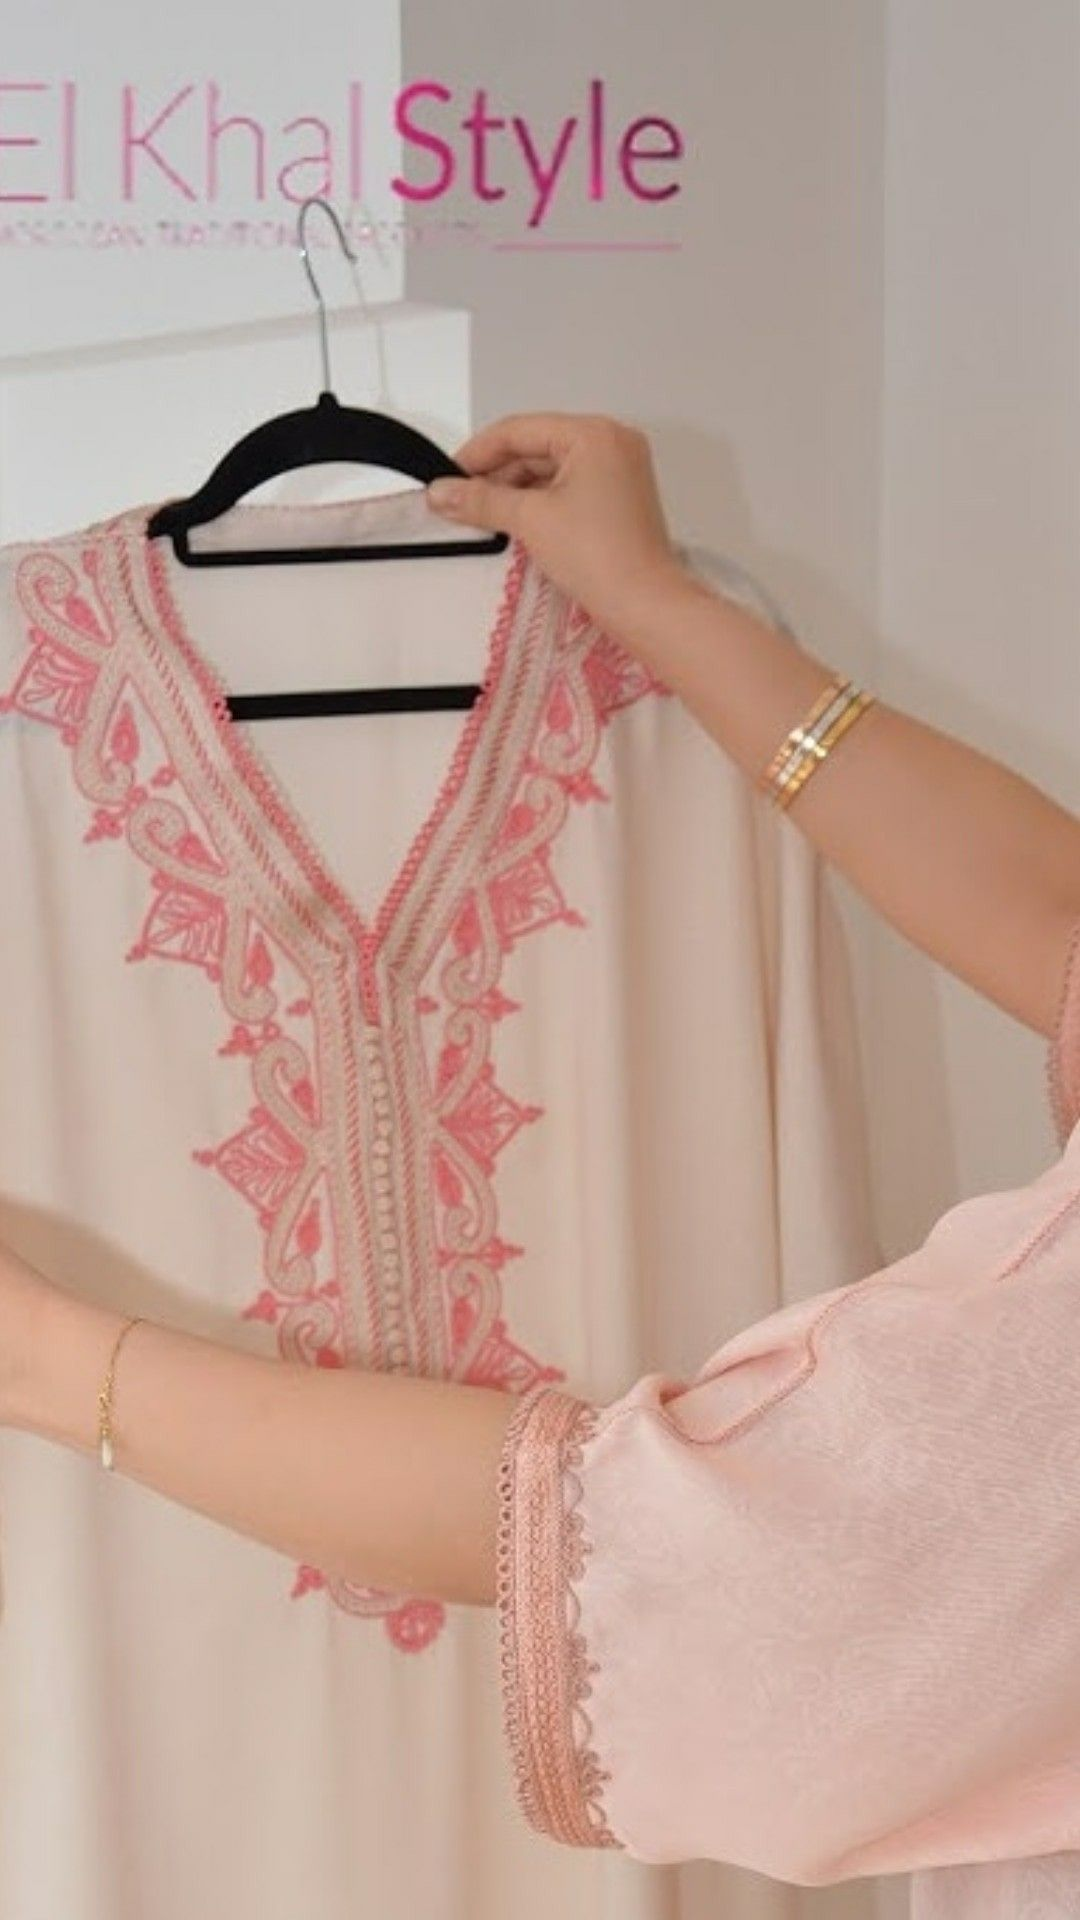 نستقبل طلبات تفصيل لرمضان والعيد Elkhal Style Elkhal Style Elkhal Style تفصيل خياطة عبايات فستان زواج جلابية جلابة مغر Fashion Dresses Fashion Style